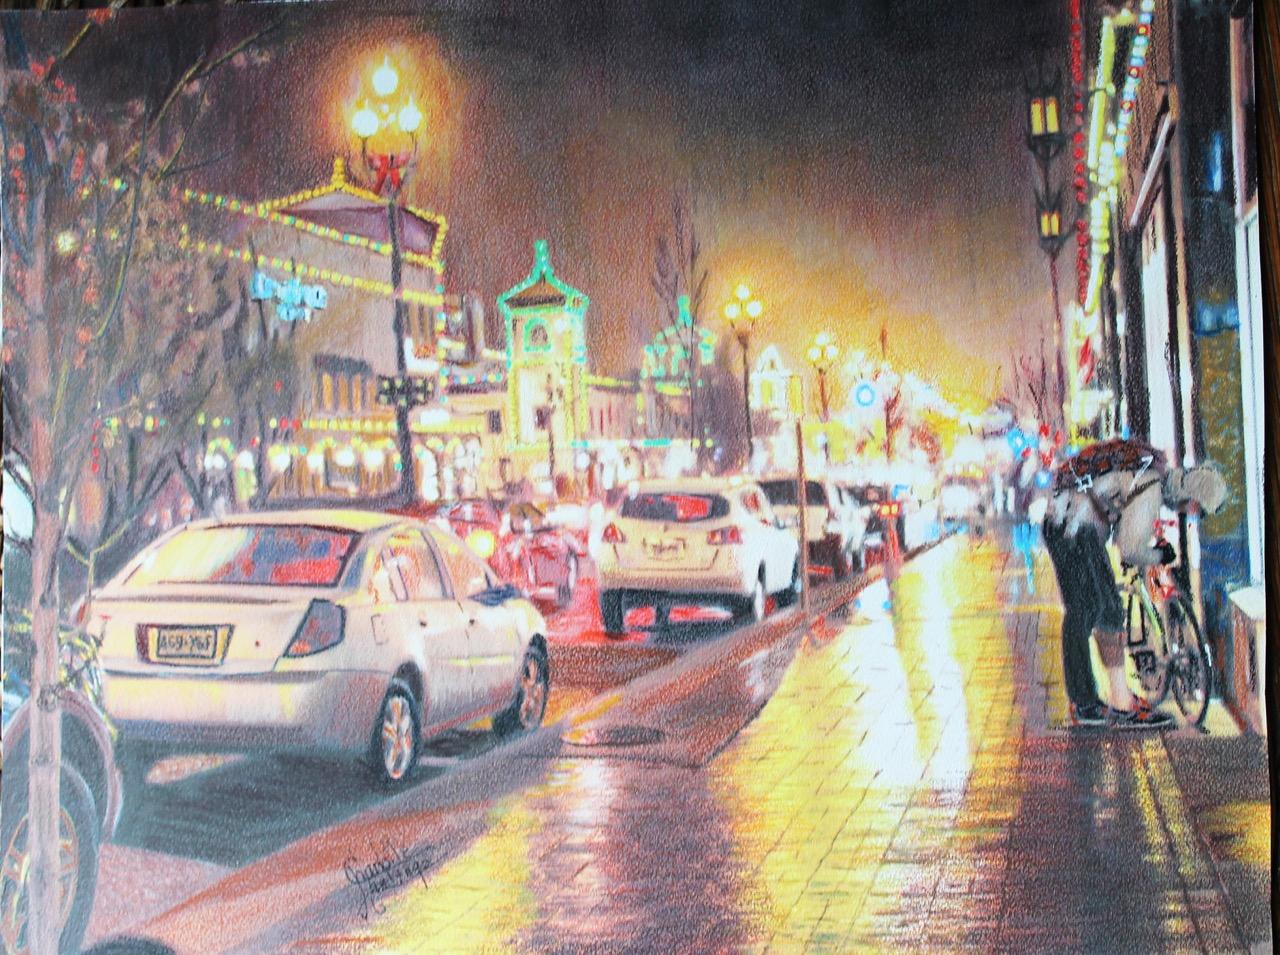 Evening Plaza K.C. by Chrlotte Hastings